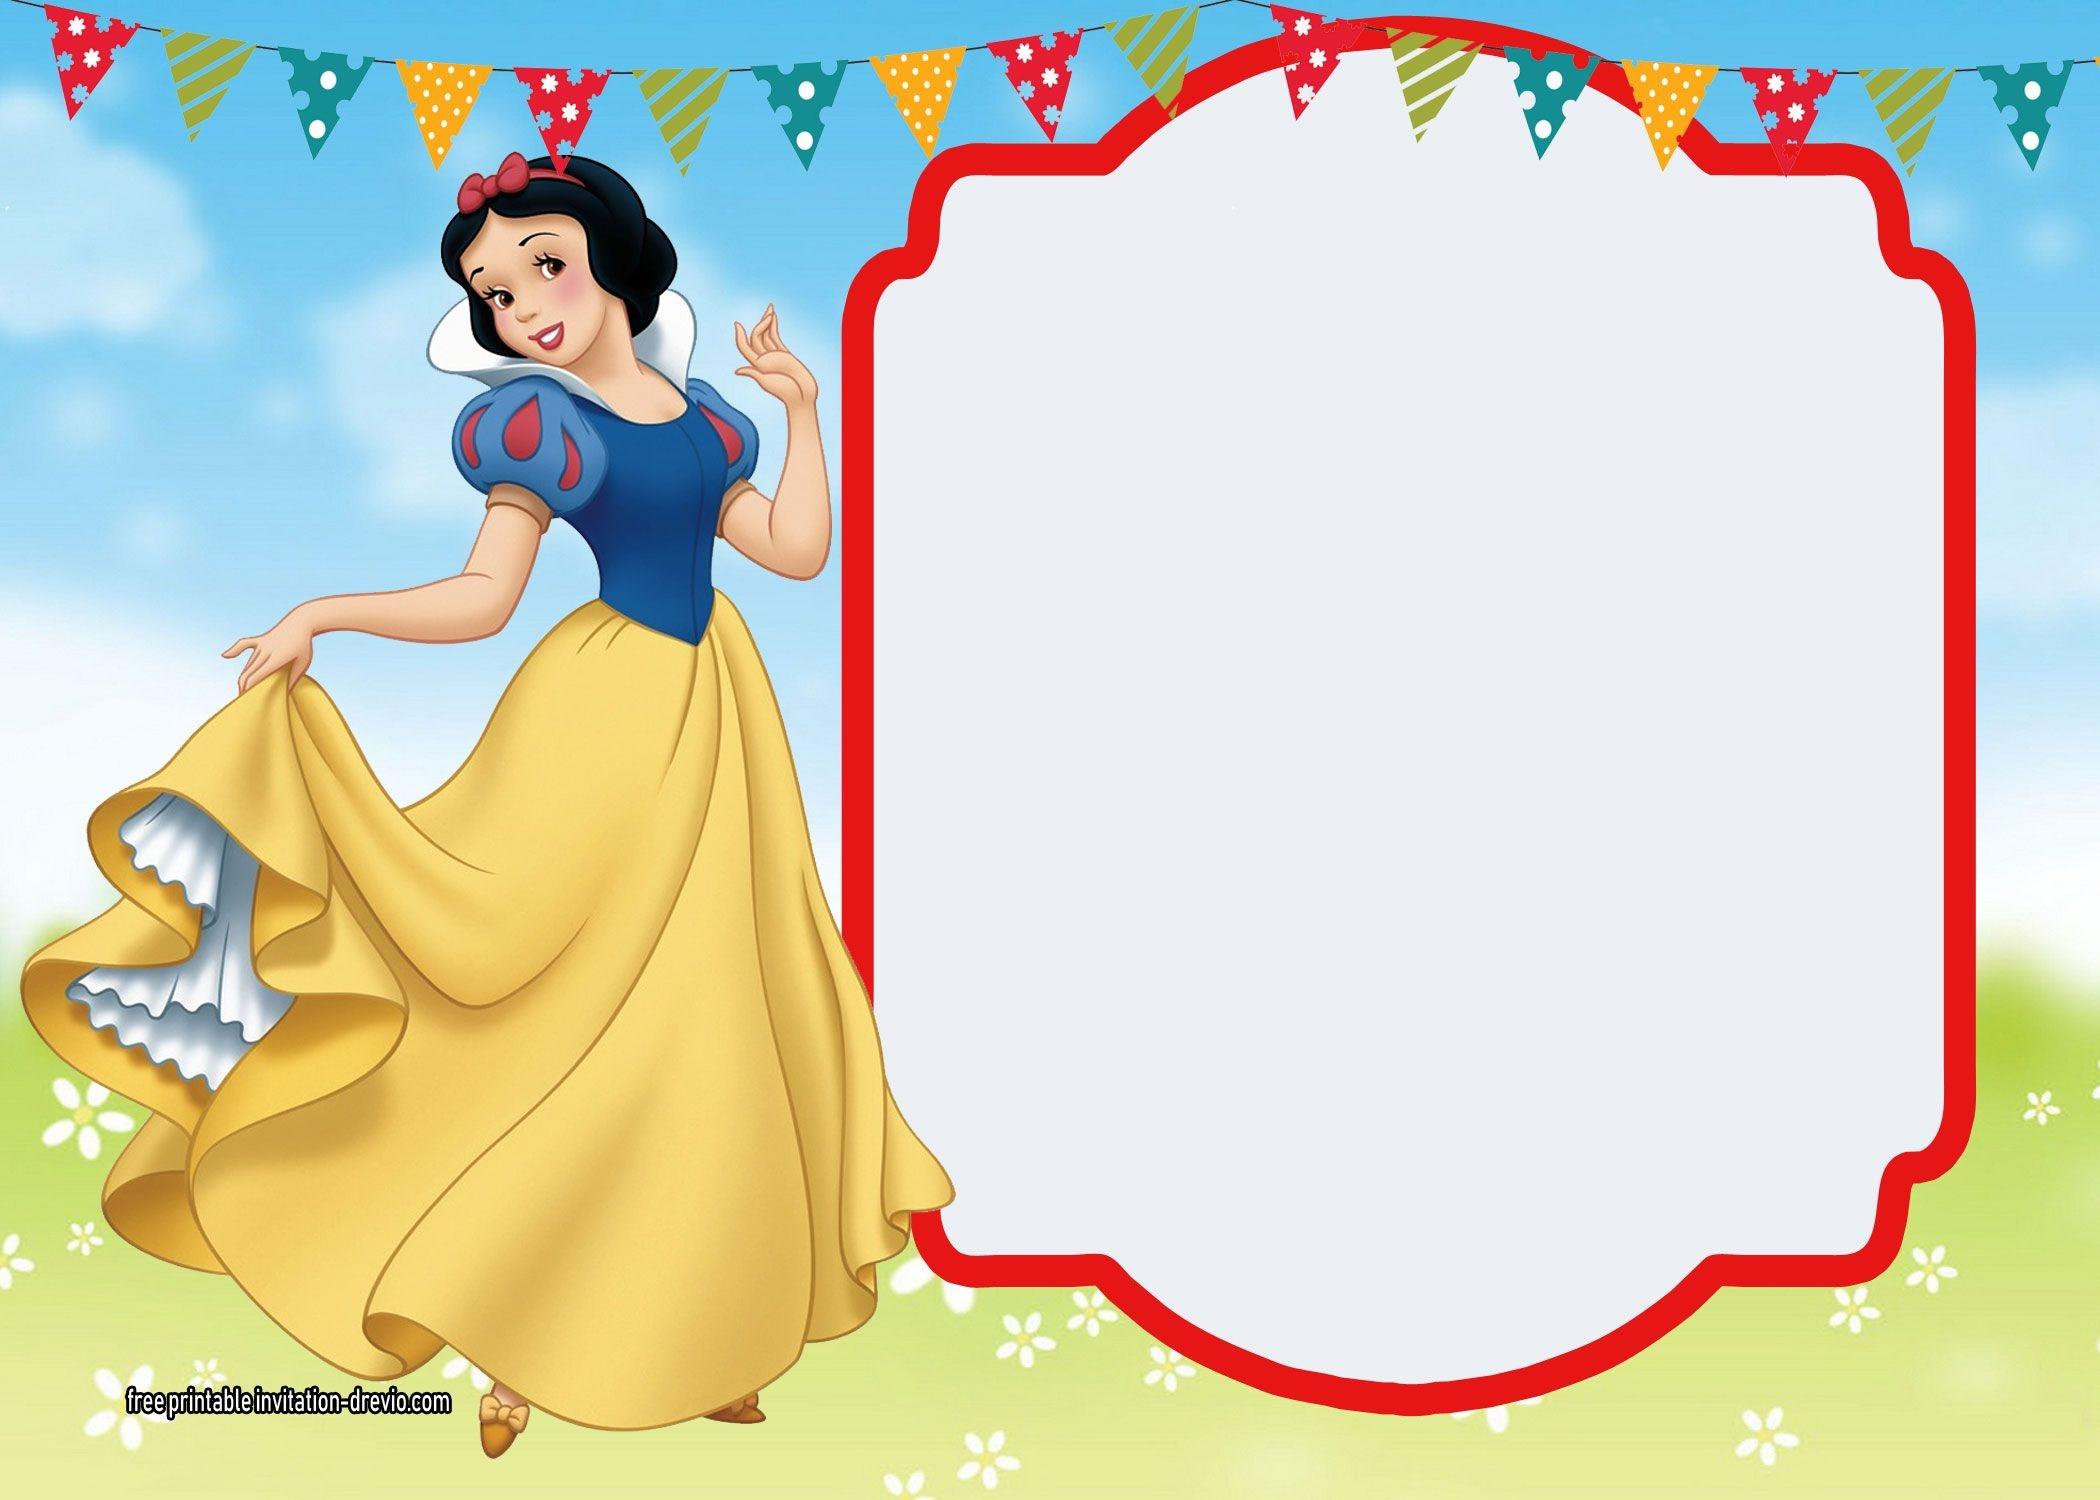 Free Printable Snow White Invitations - Complete Edition | Snow - Snow White Invitations Free Printable